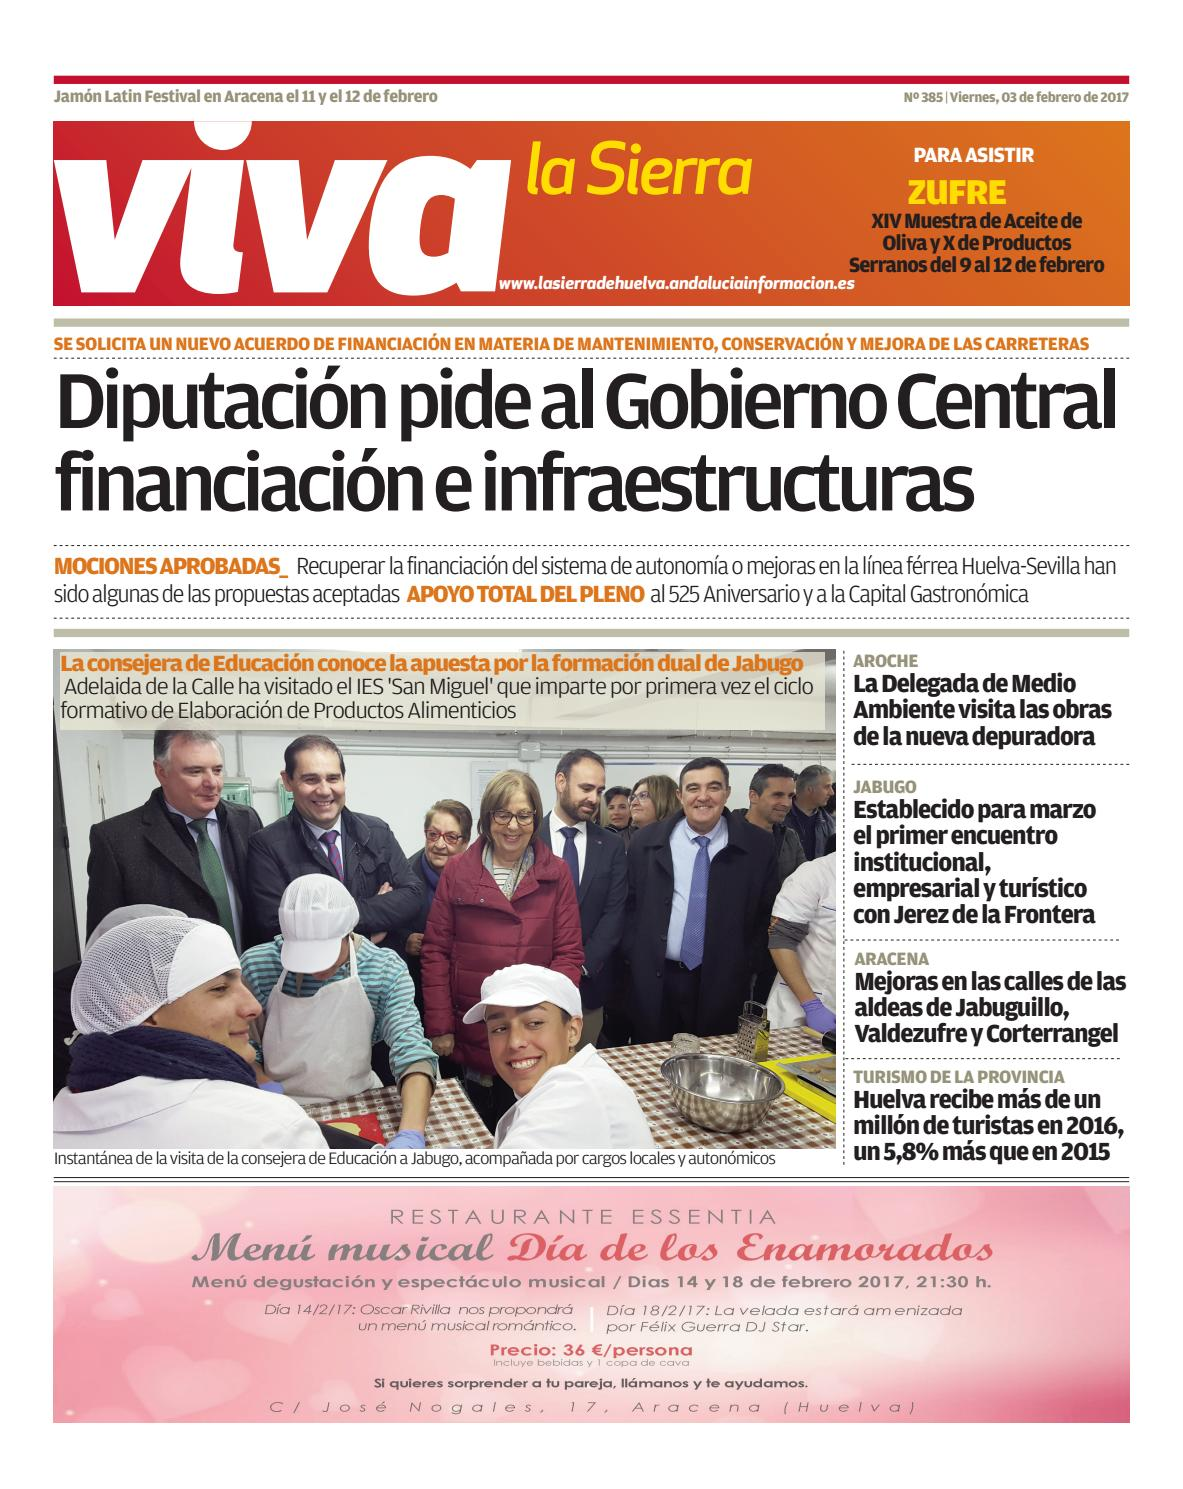 Viva la sierra 03 02 17 by onubactual - issuu